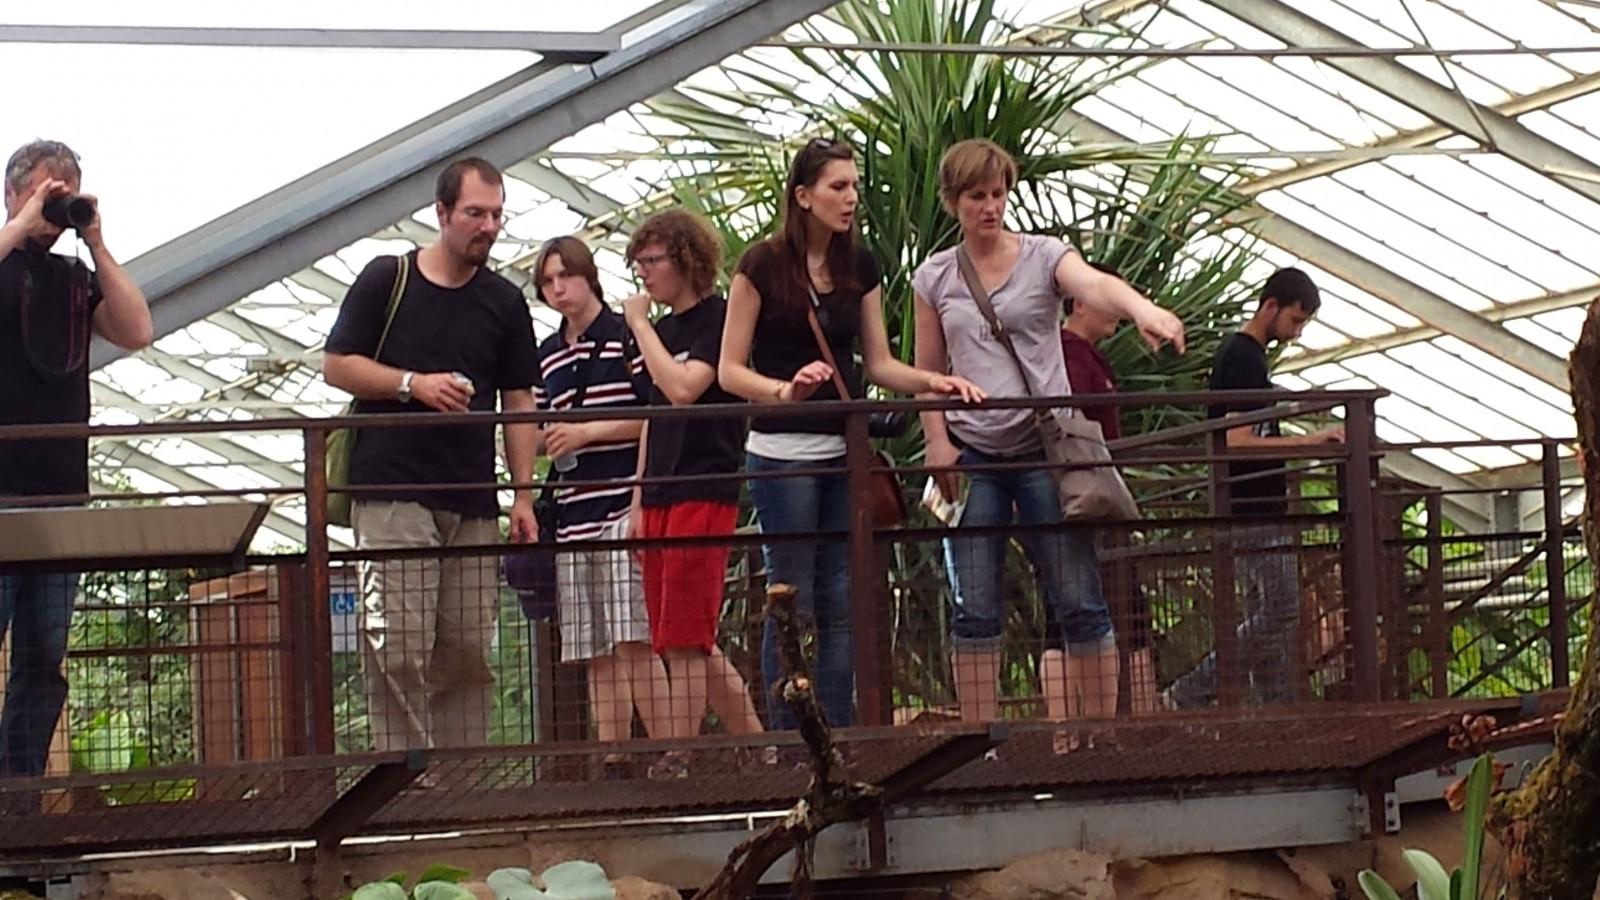 Ecole cheval paysage amiti franco allemande for Halloween 2015 jardin franco allemand sarrebruck